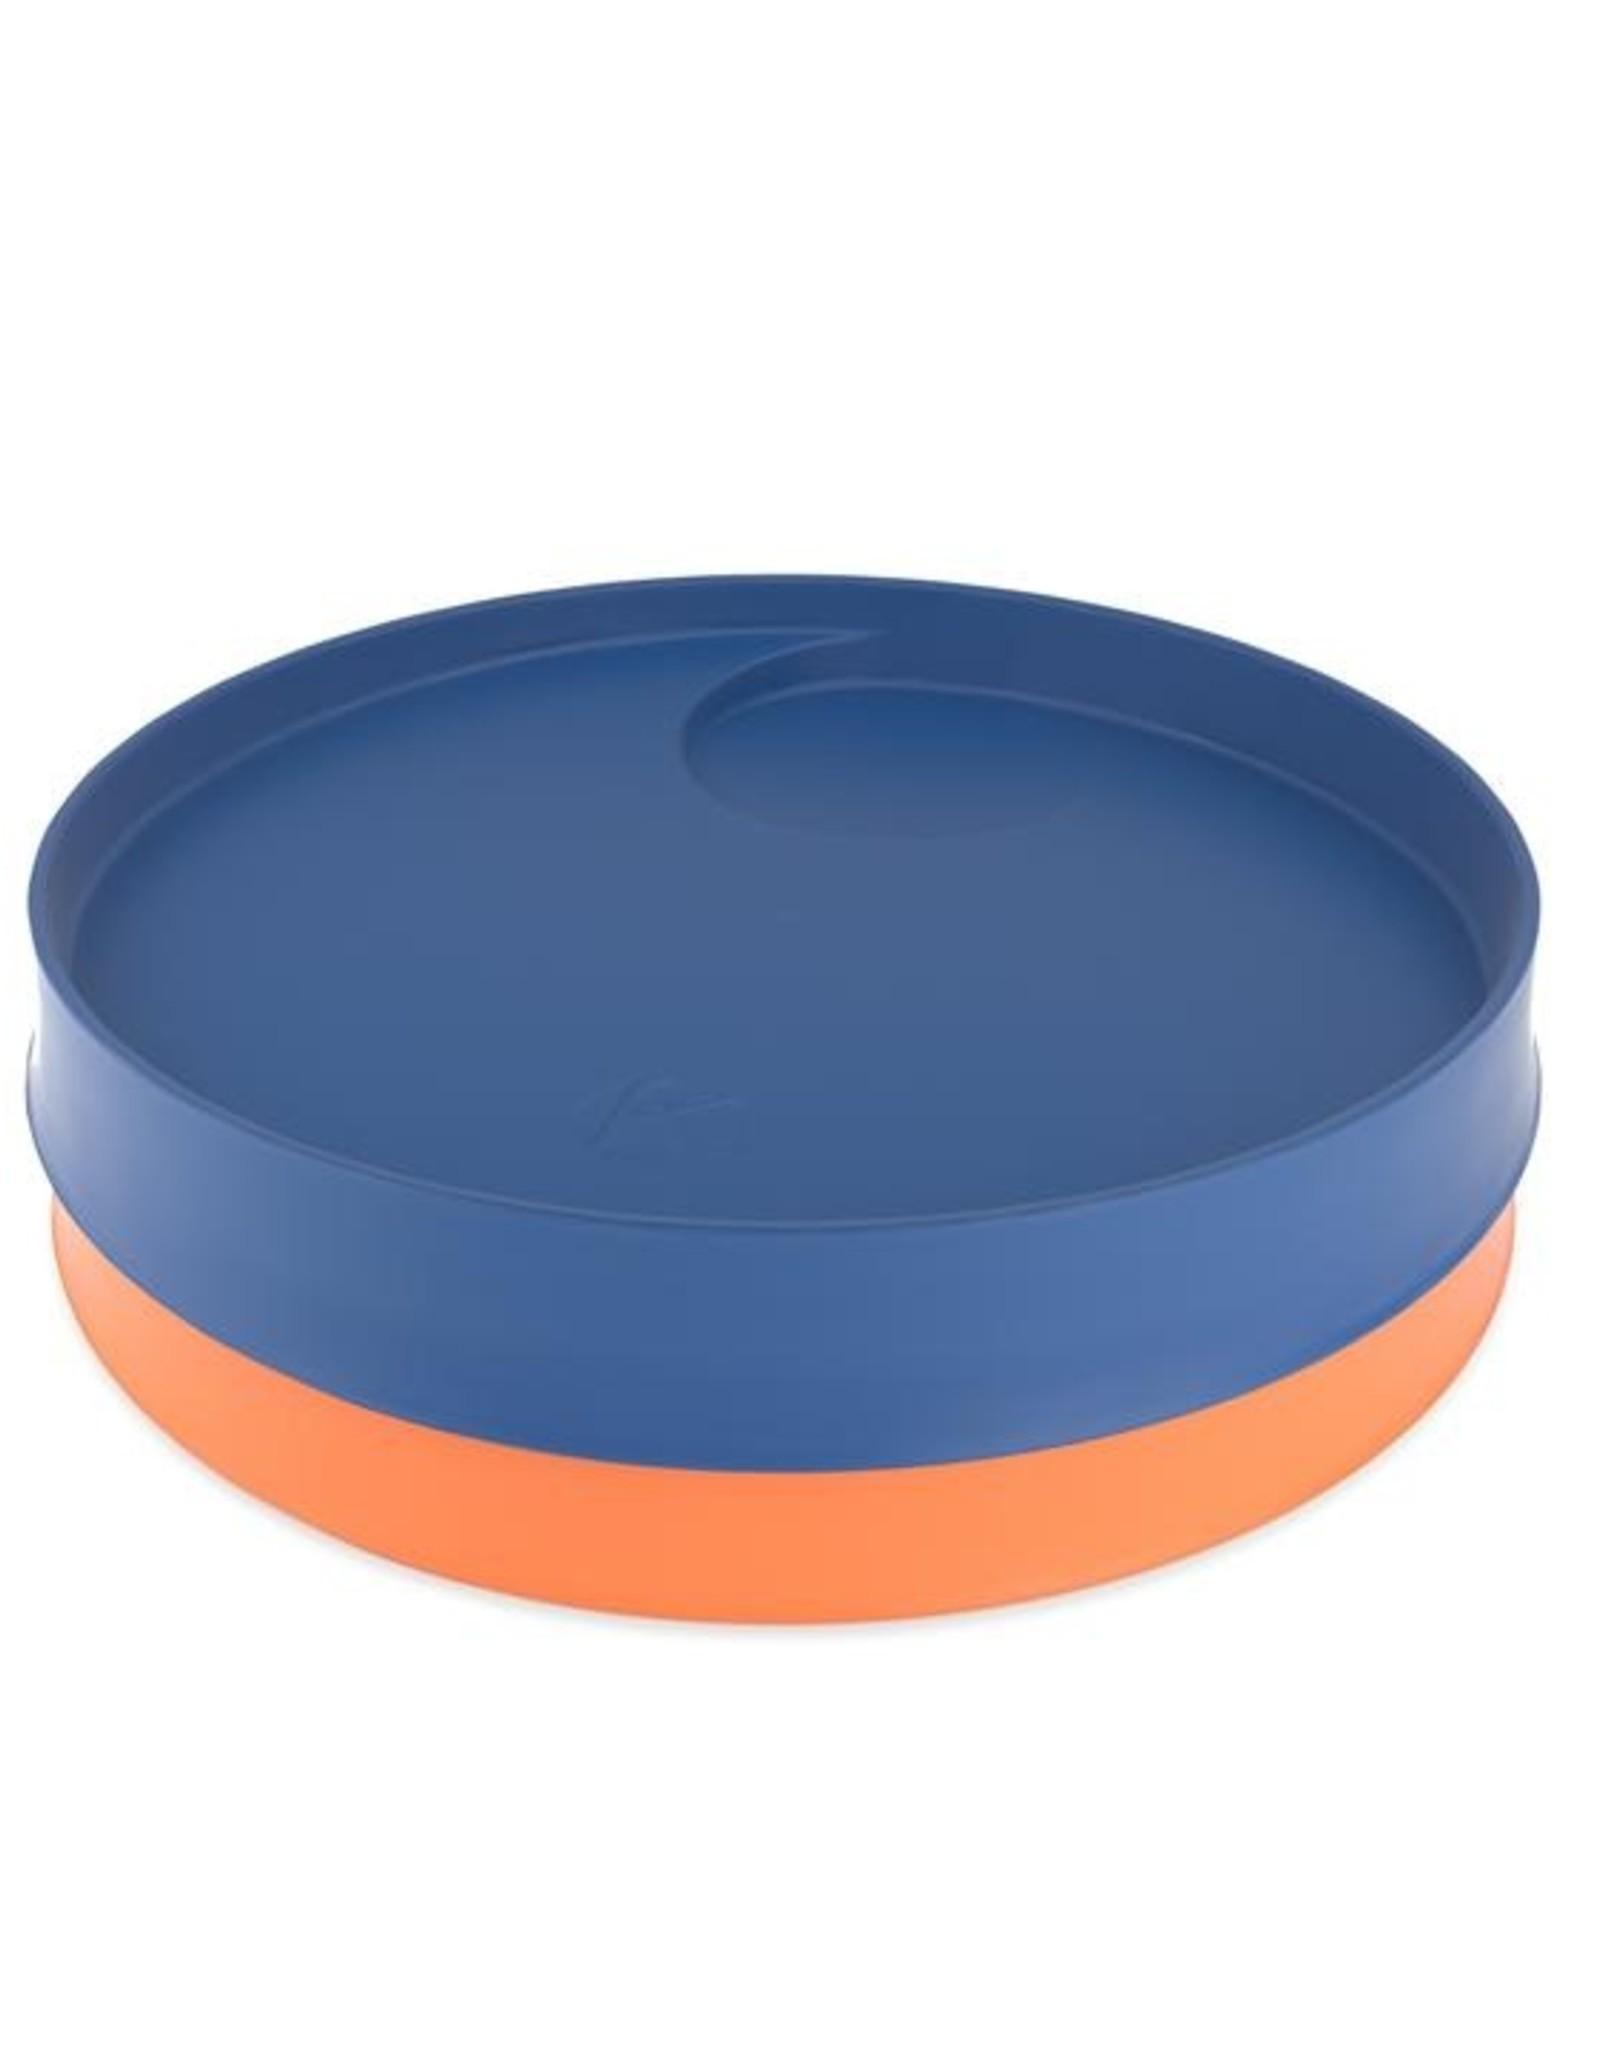 Kizingo Kinderborden NUDGE blauw/oranje - set van 2